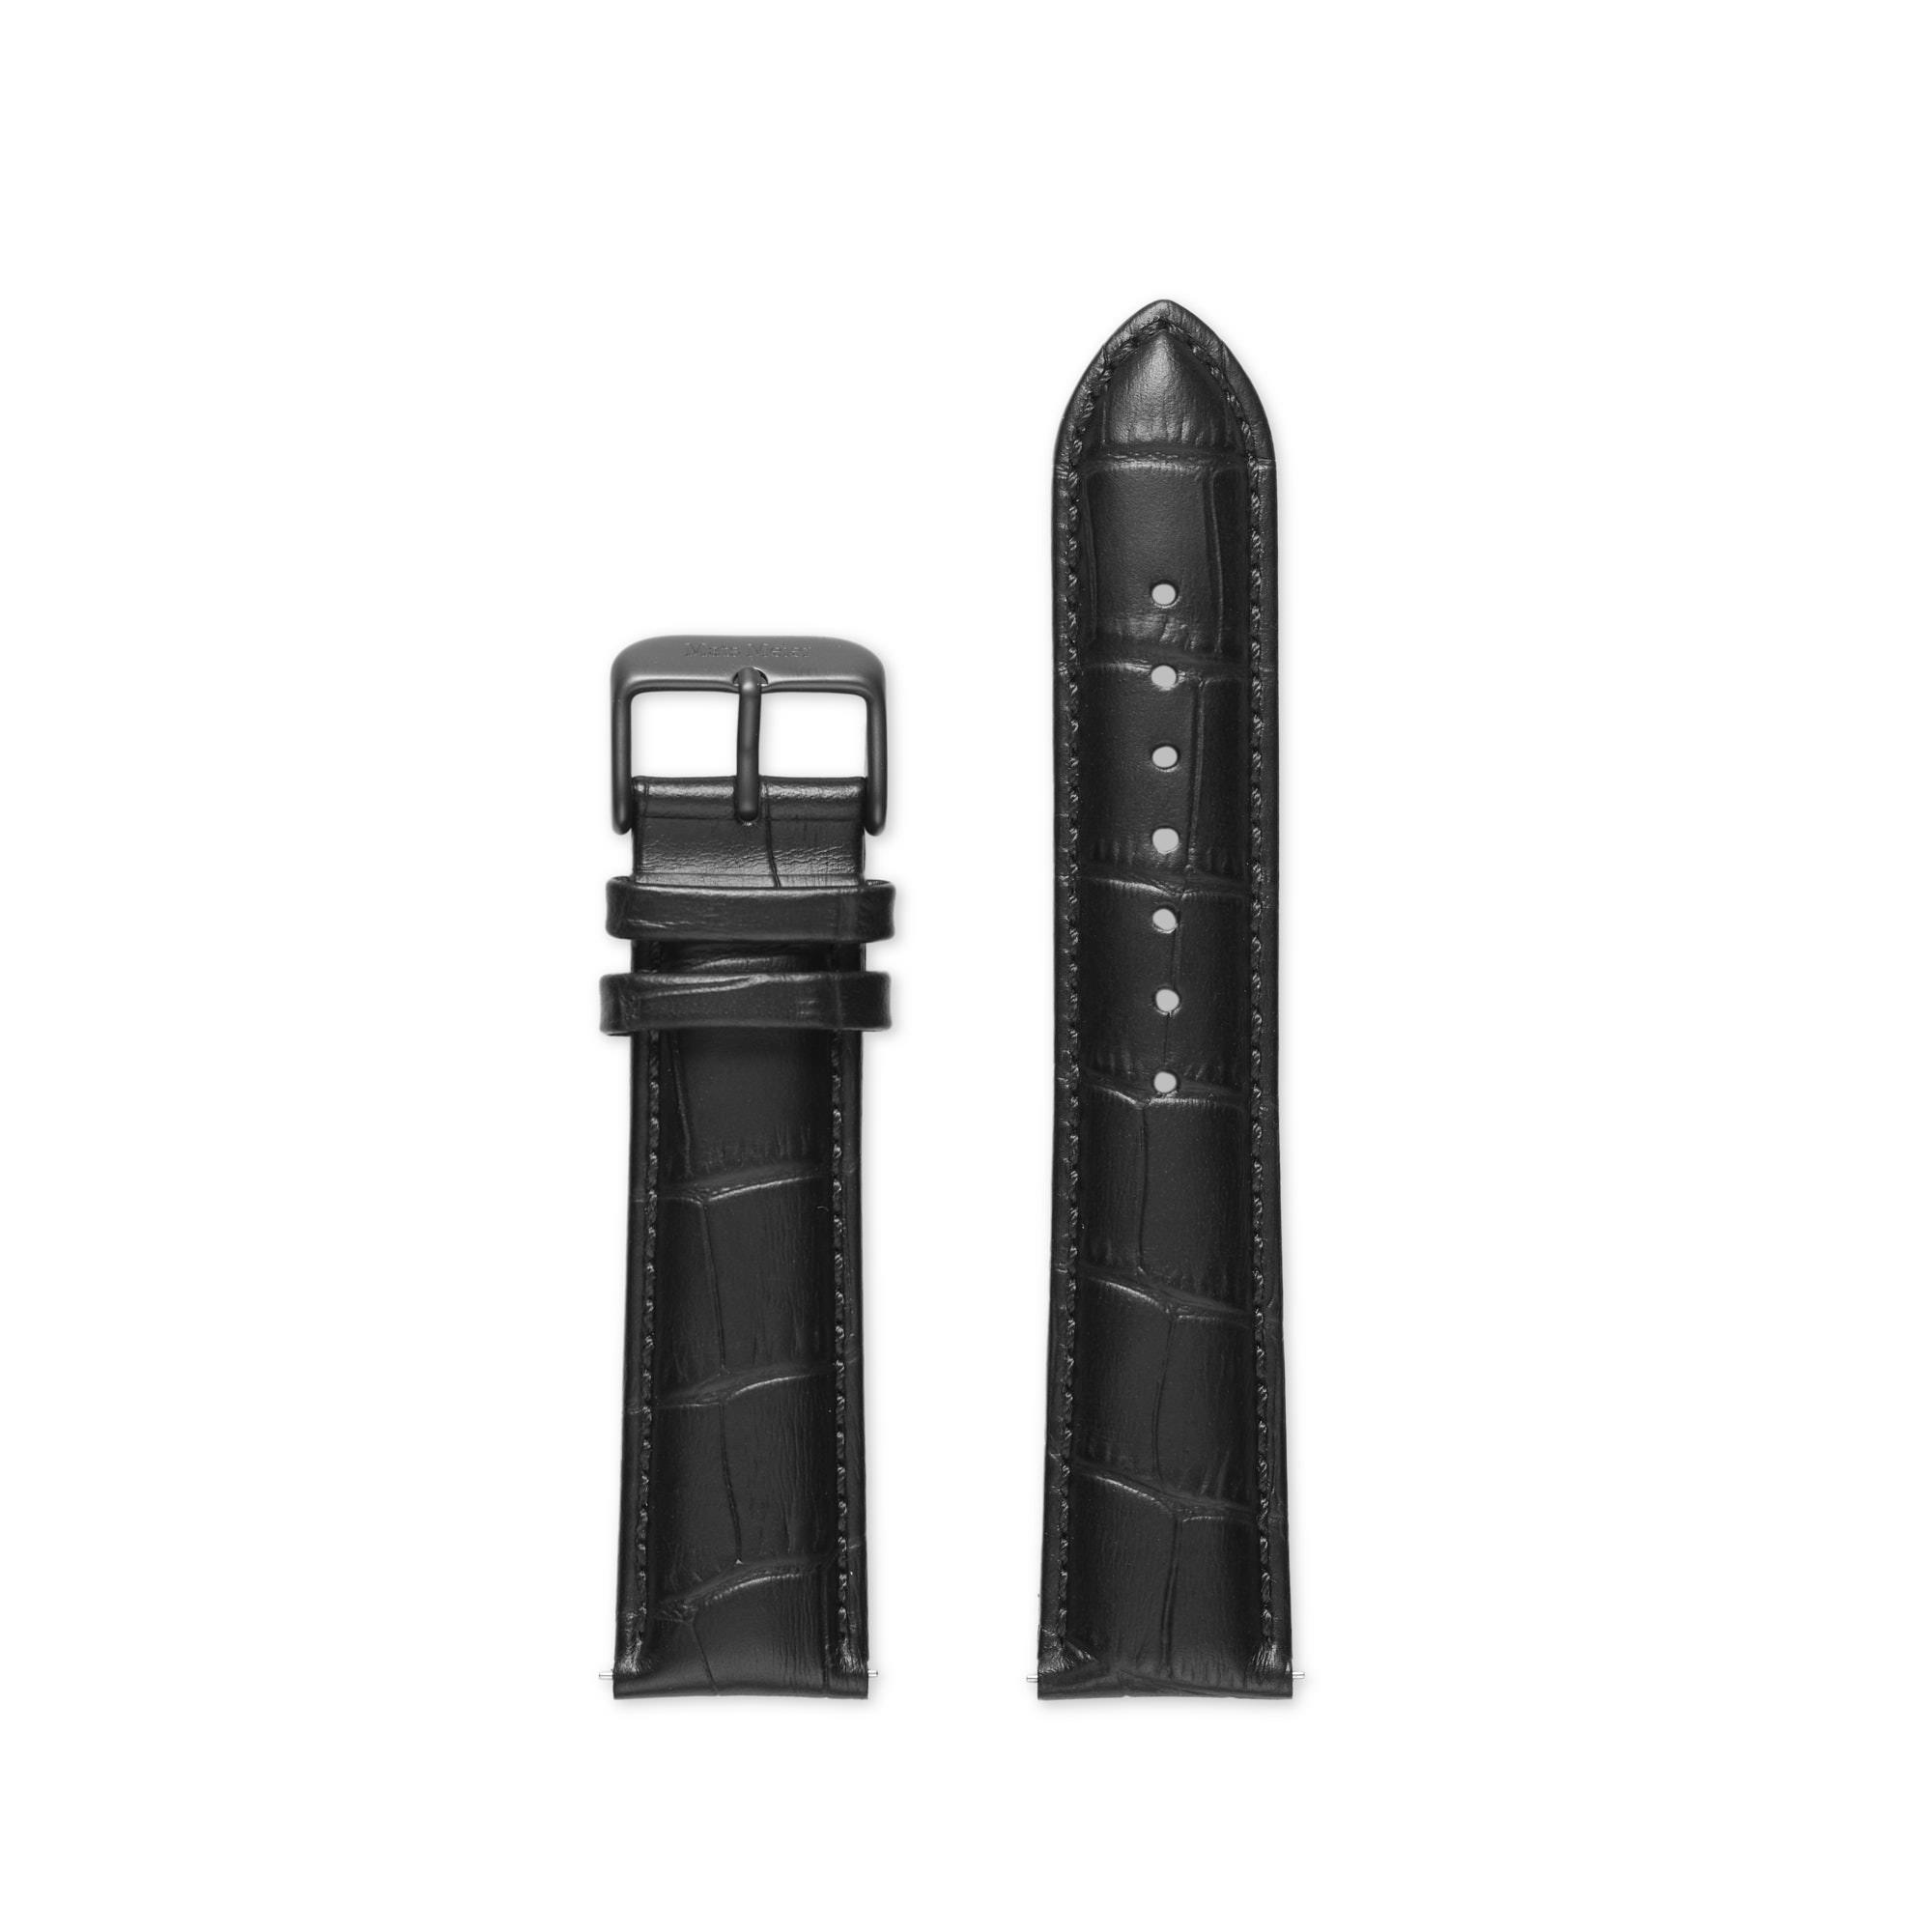 Mats Meier Leather Strap 20mm Croco Black